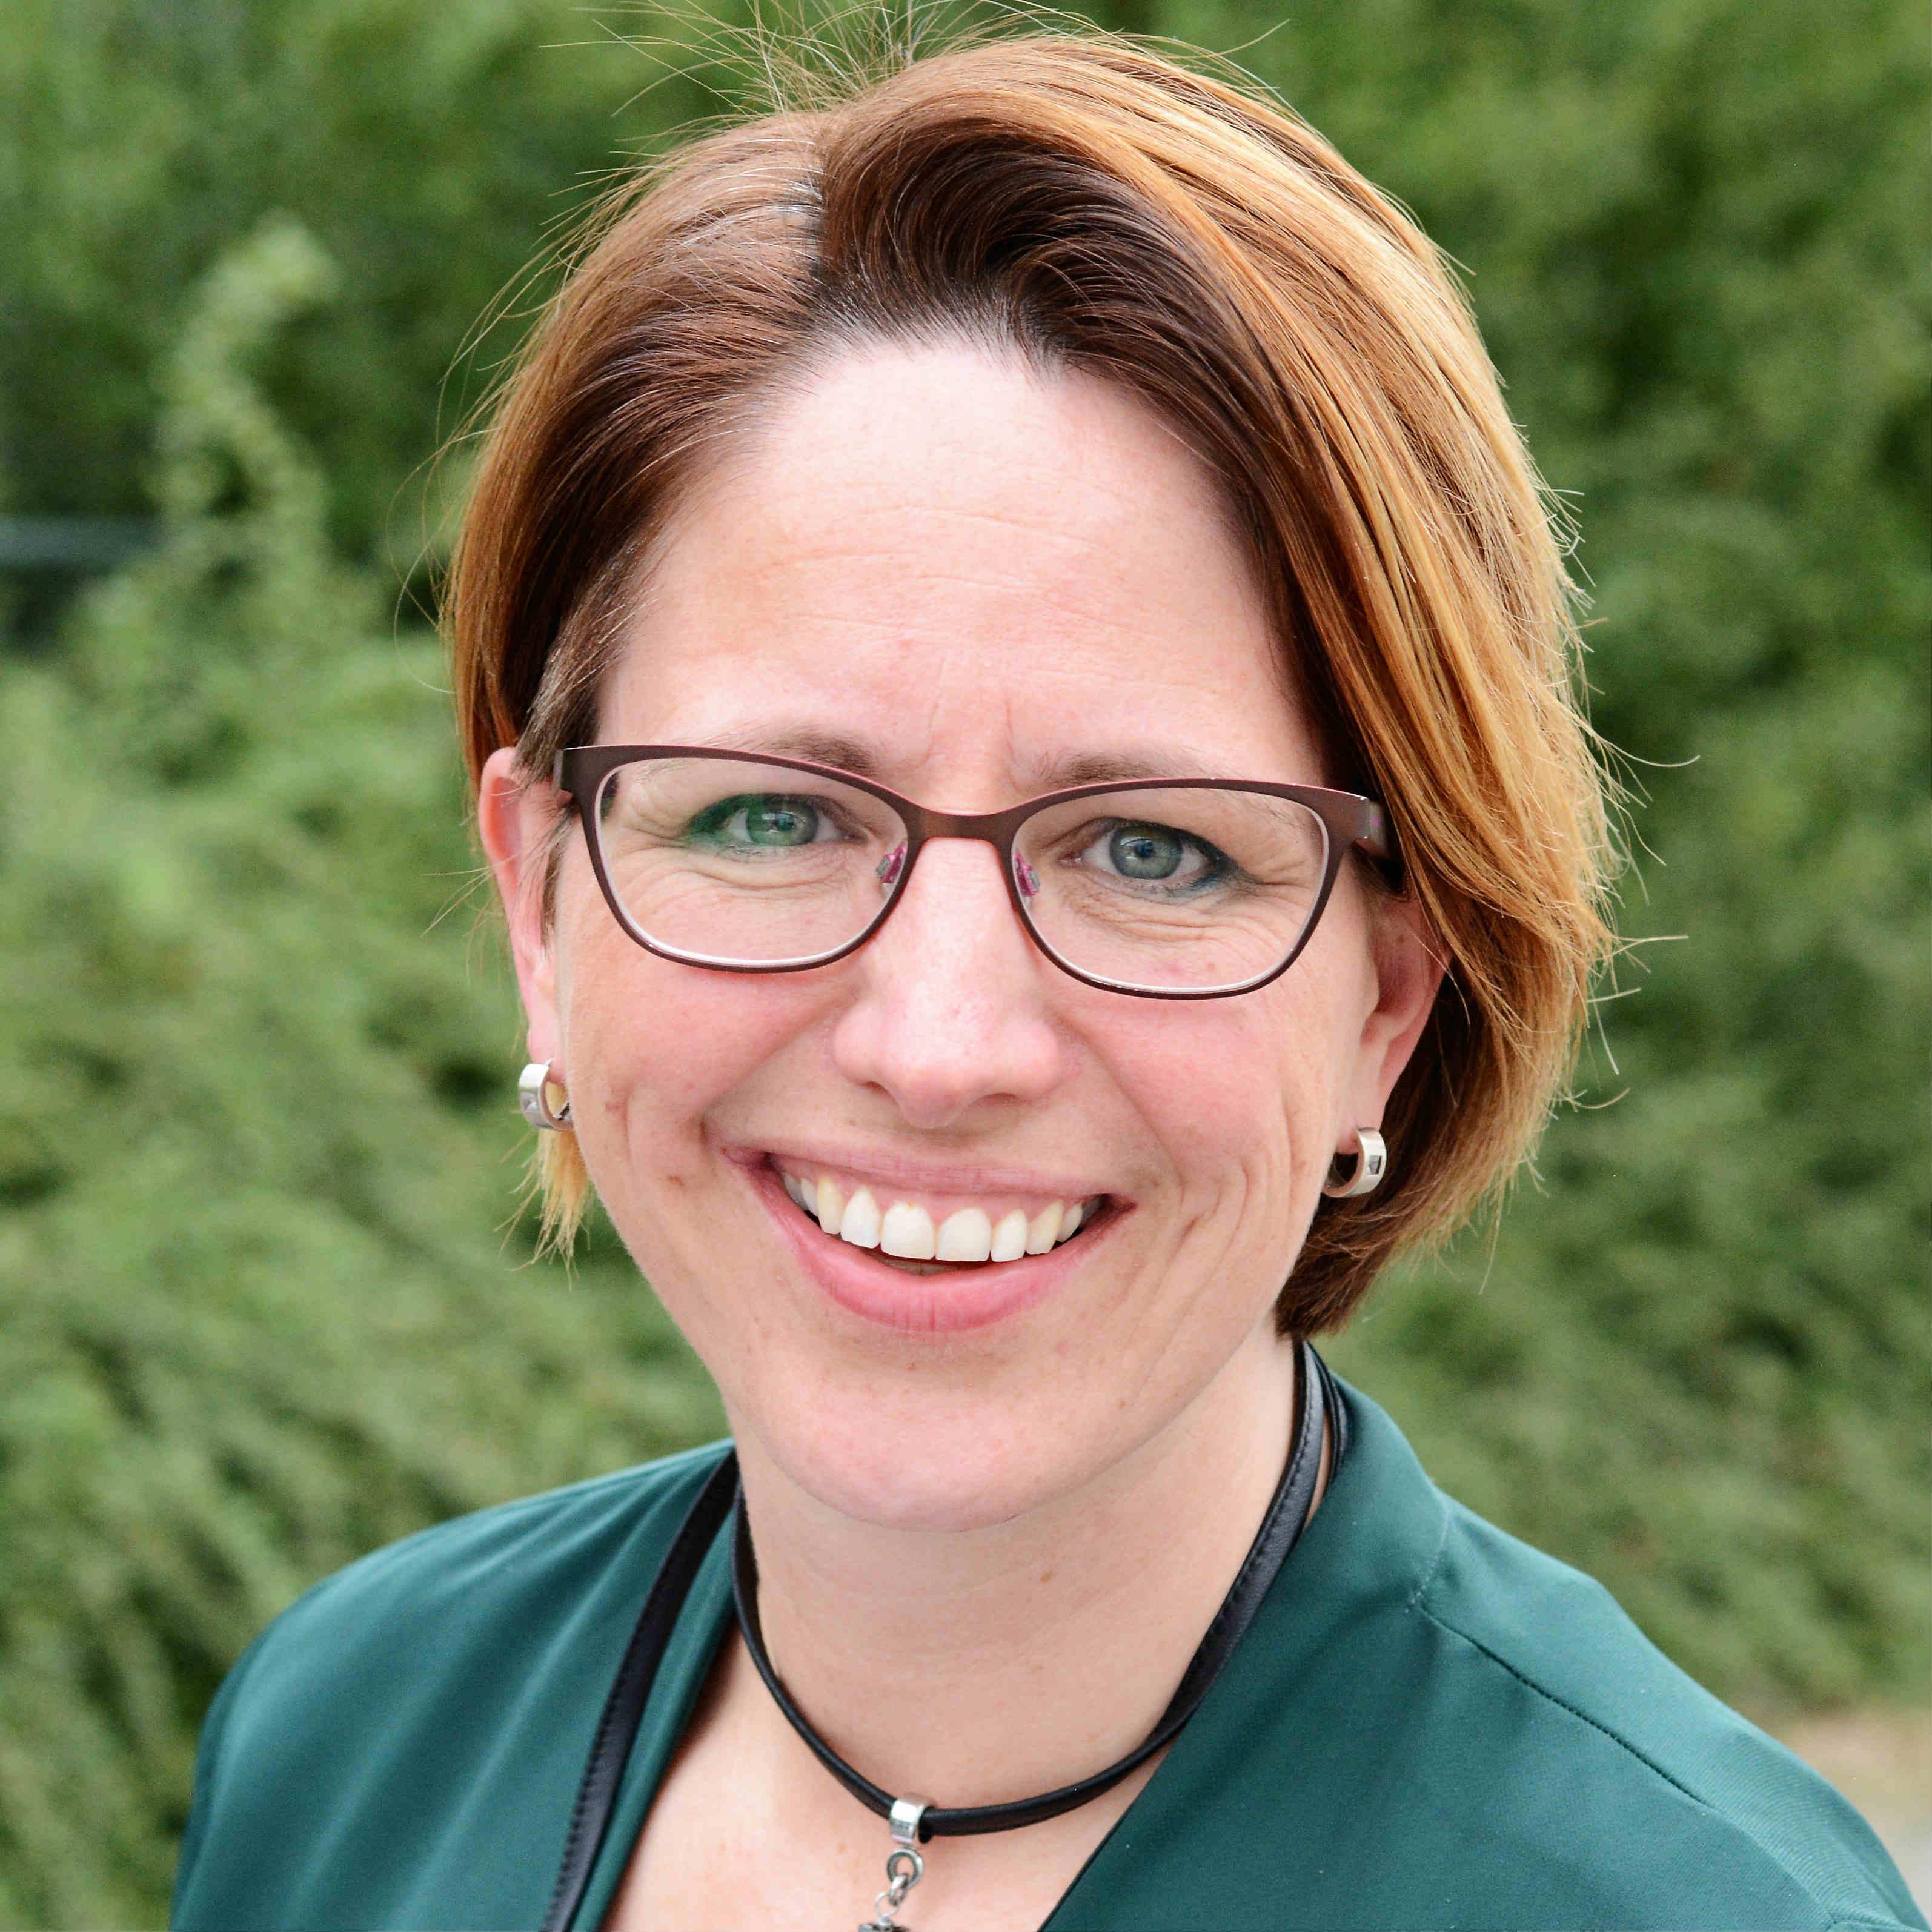 Judith Westendorp